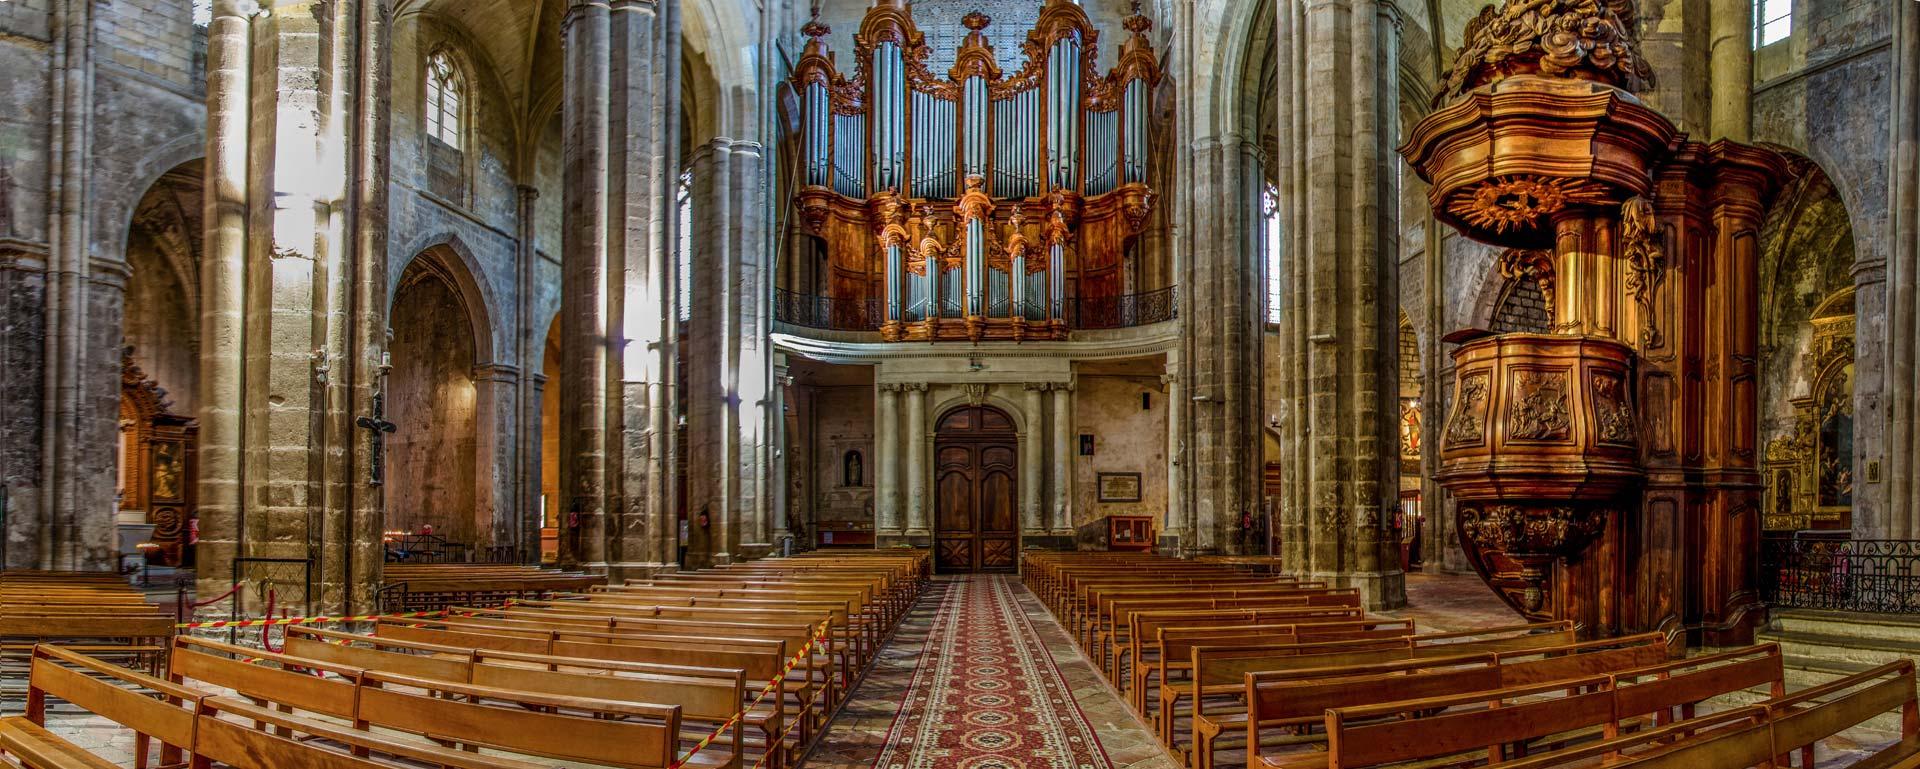 basilique saint maximin yann lipnick geobioenergie.fr